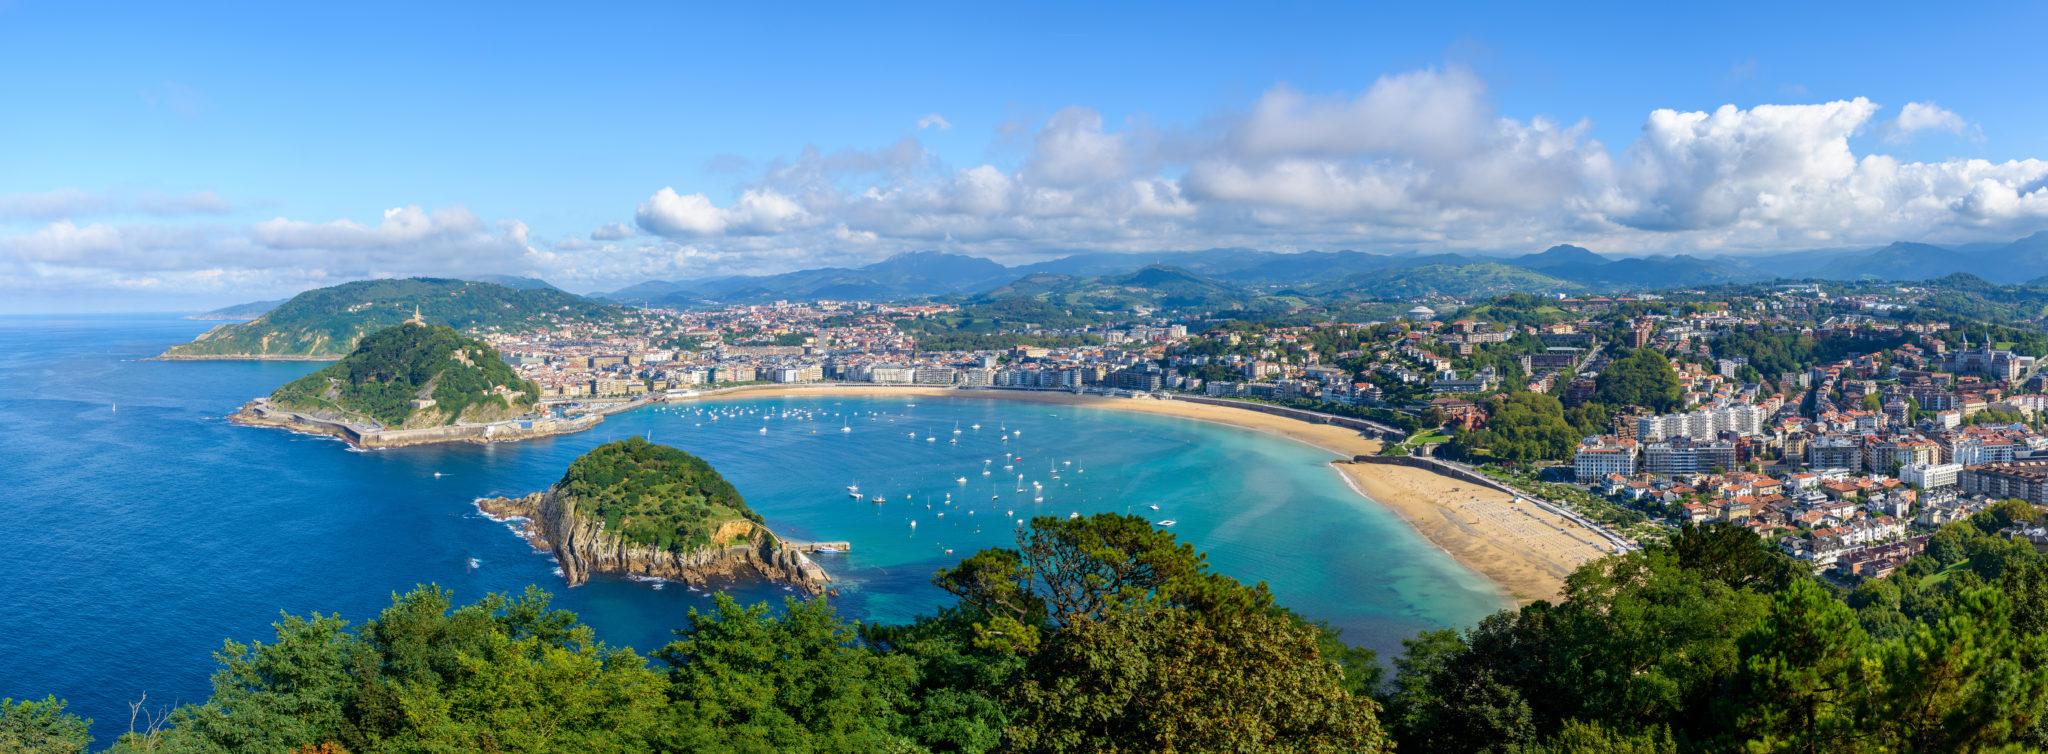 San Sebastián (Donostia)